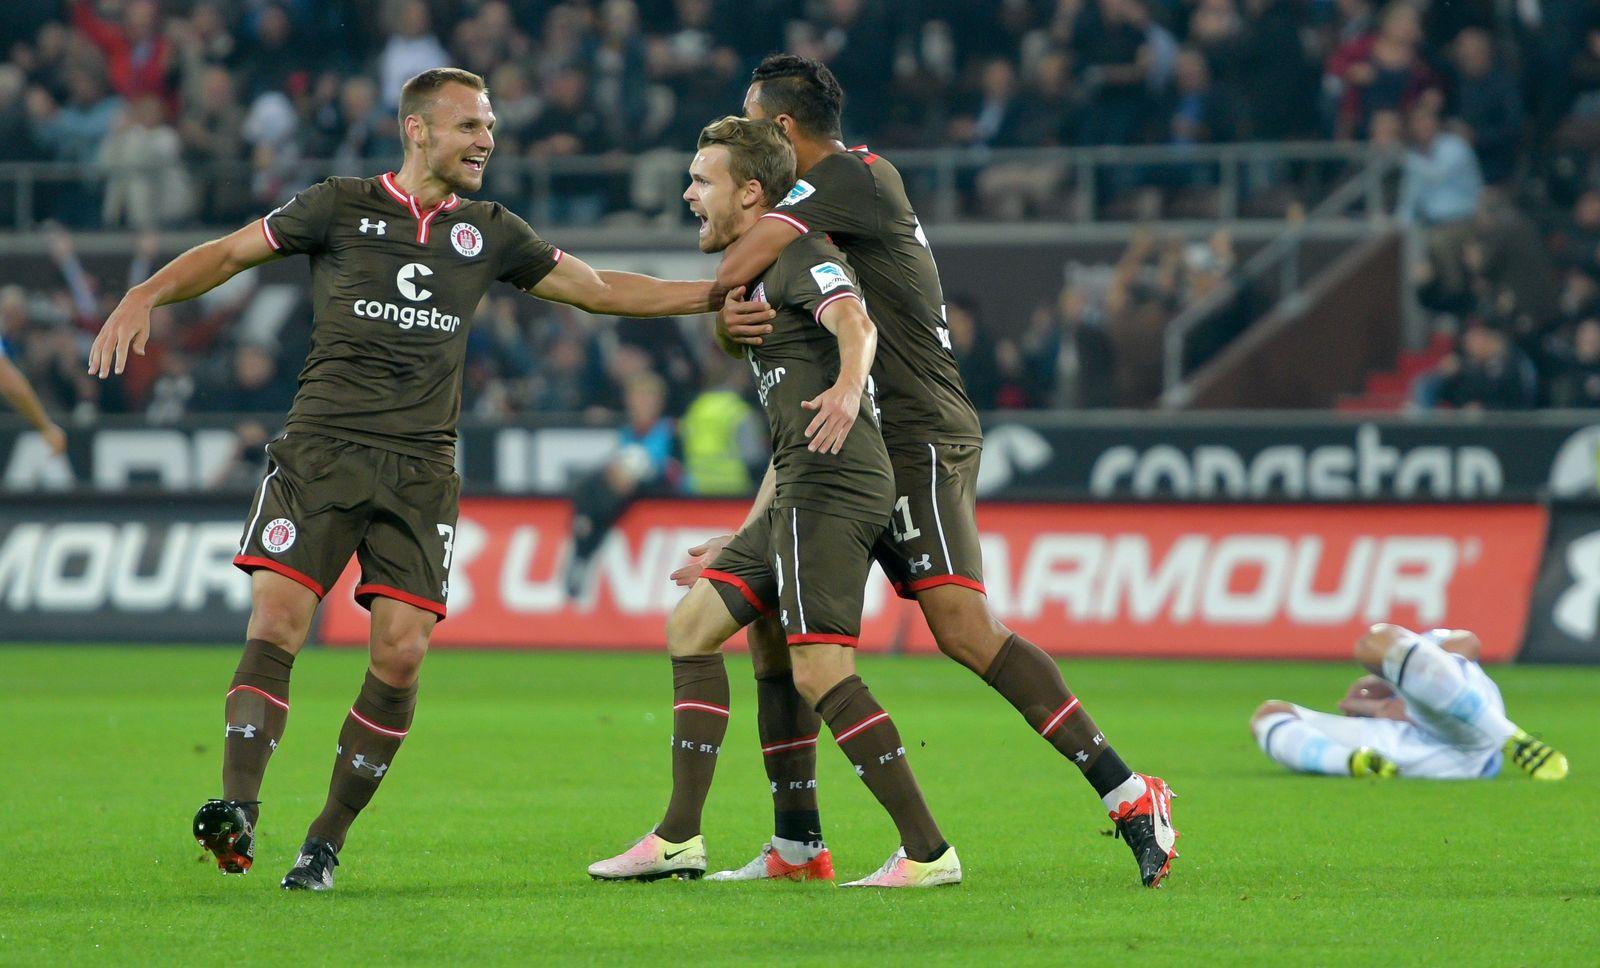 FC St. Pauli / Under Armour